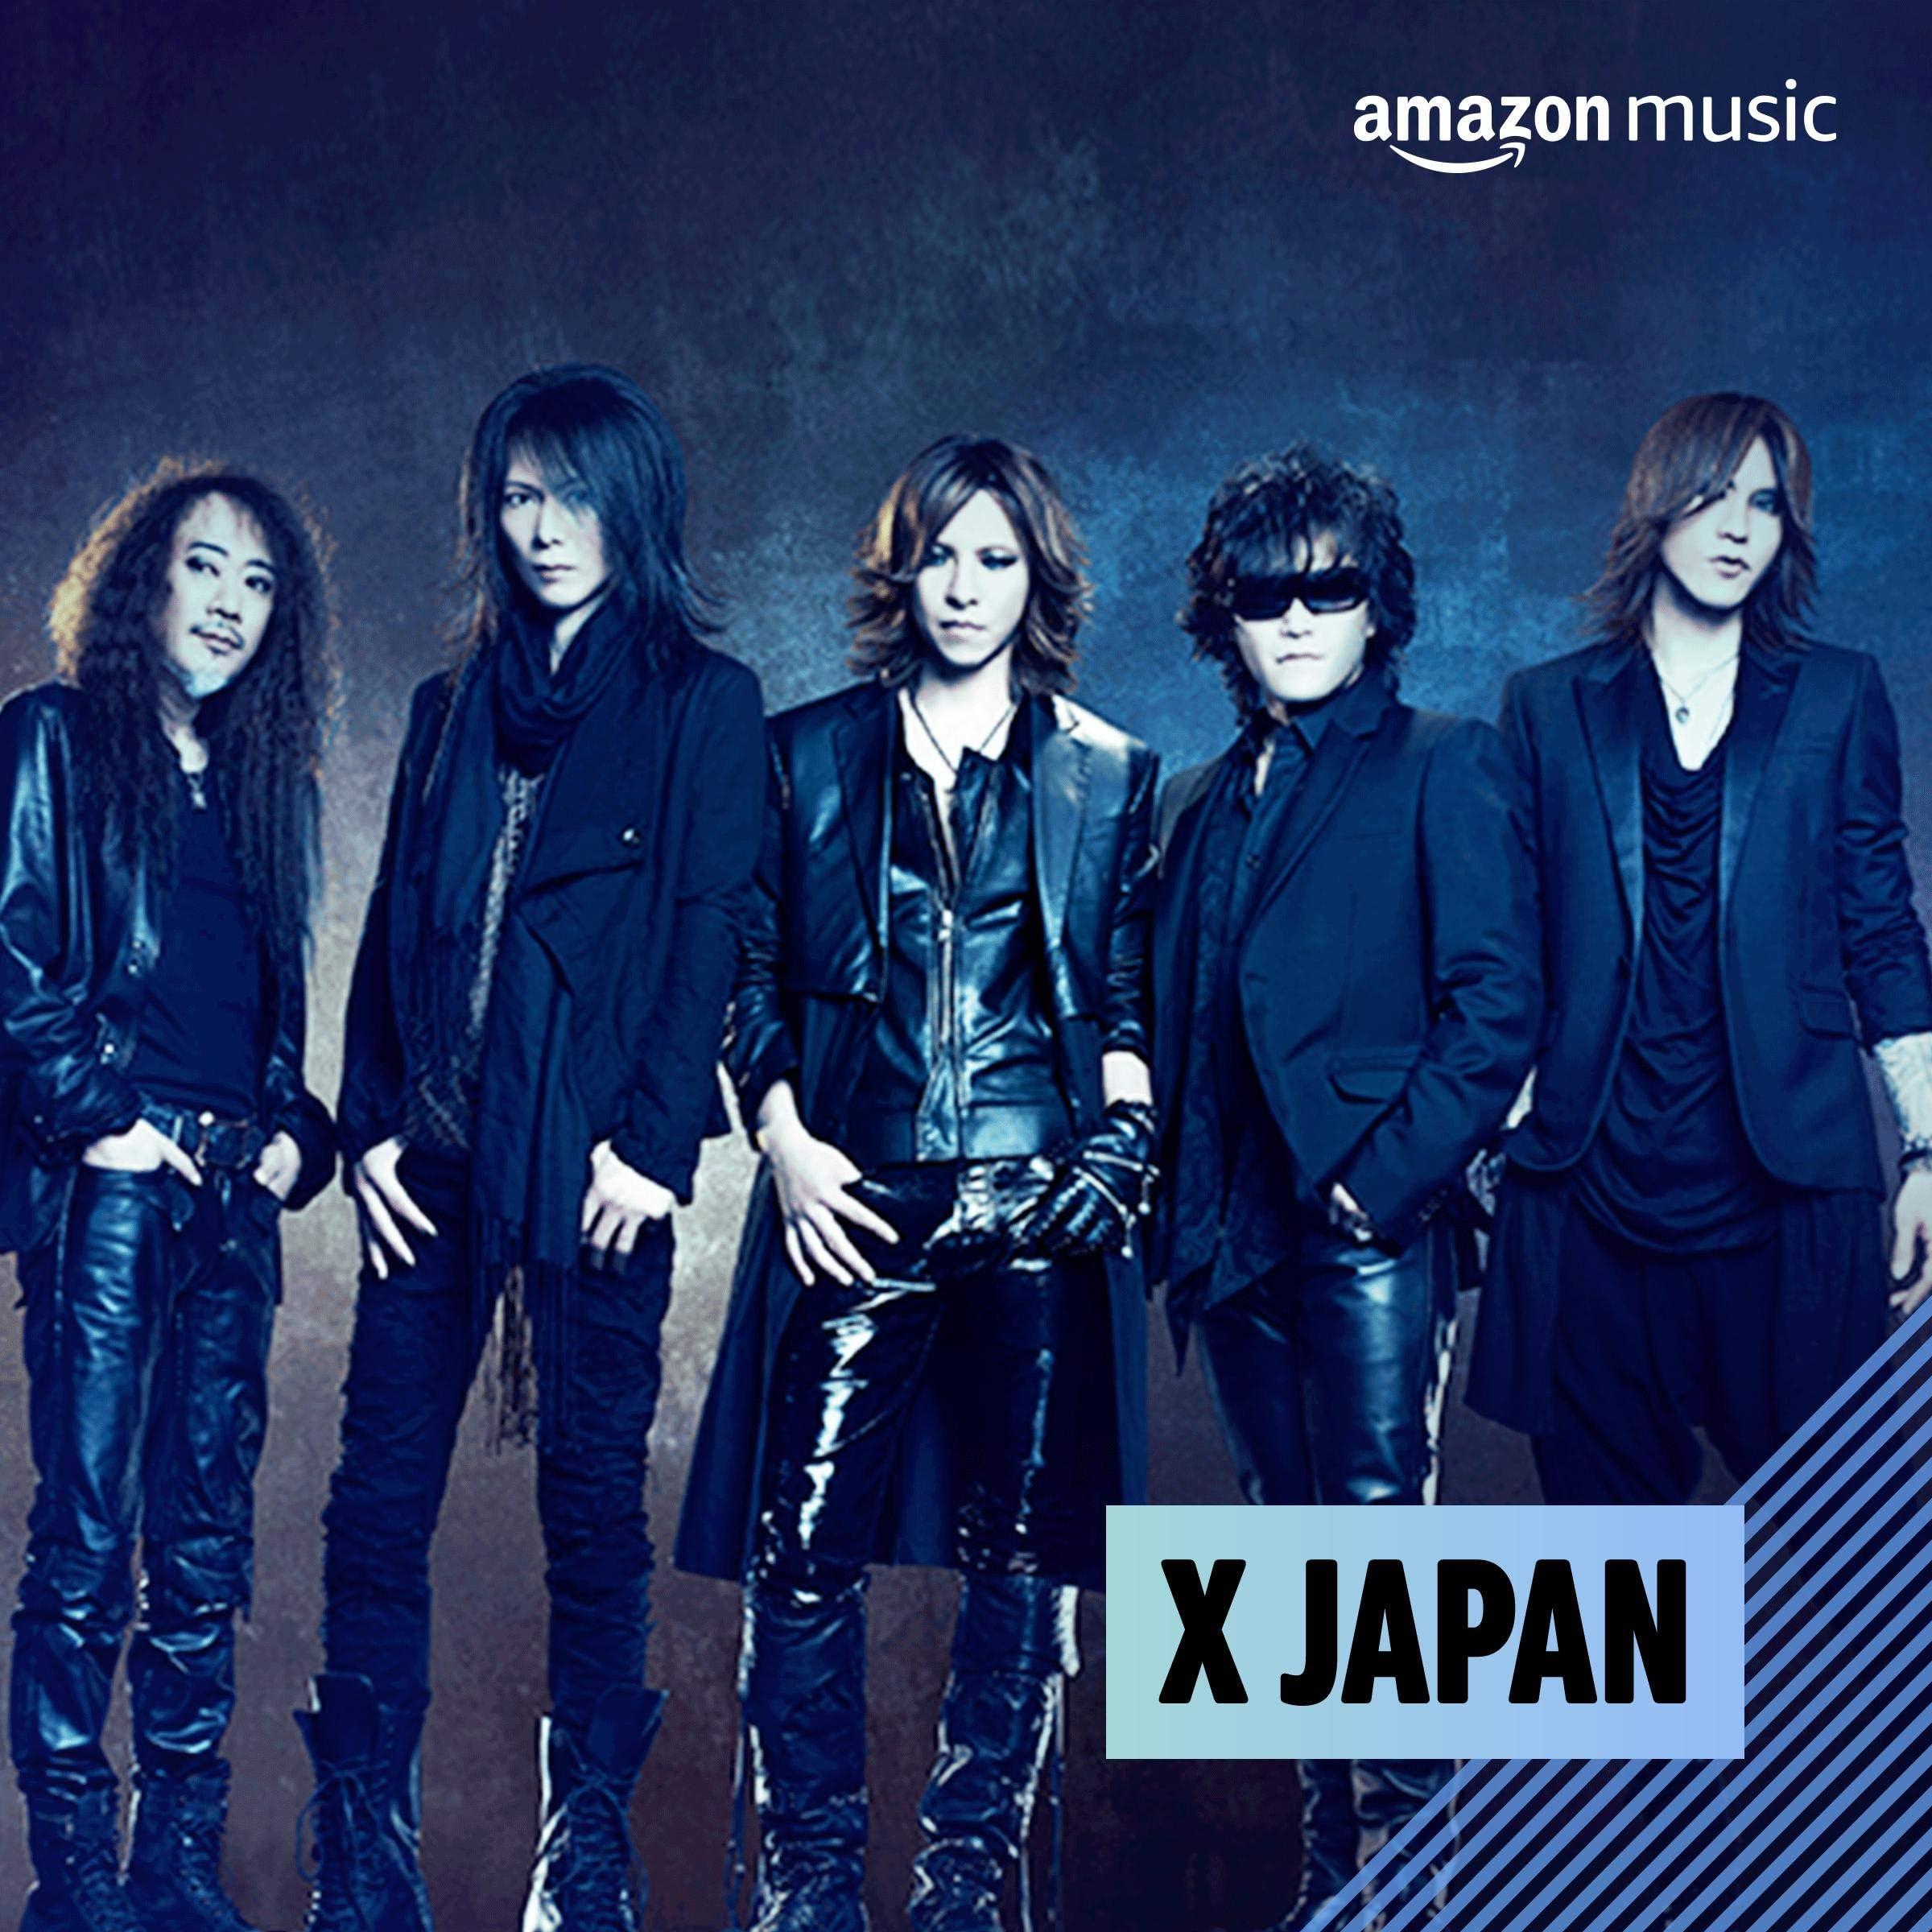 X JAPANを聴いているお客様におすすめ